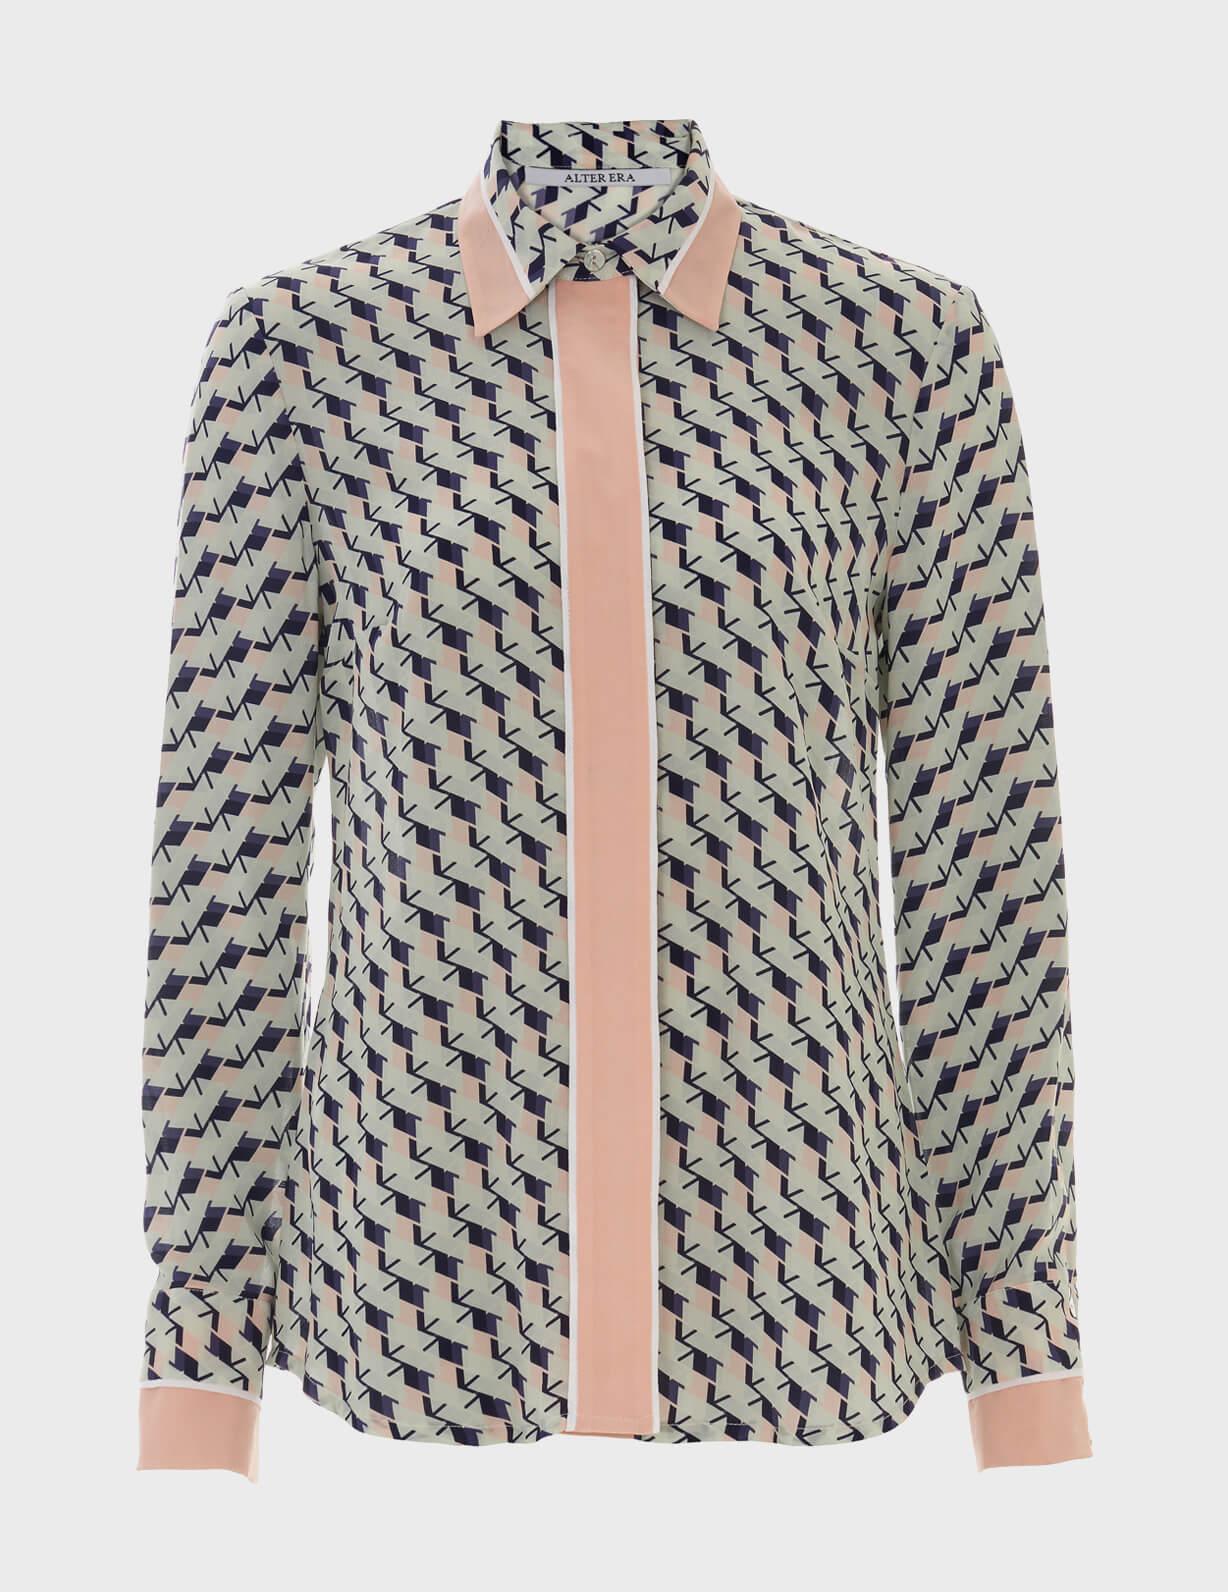 alter-era-ss18-jaha-002-printed-silk-placket-blouse-blades-front.jpg